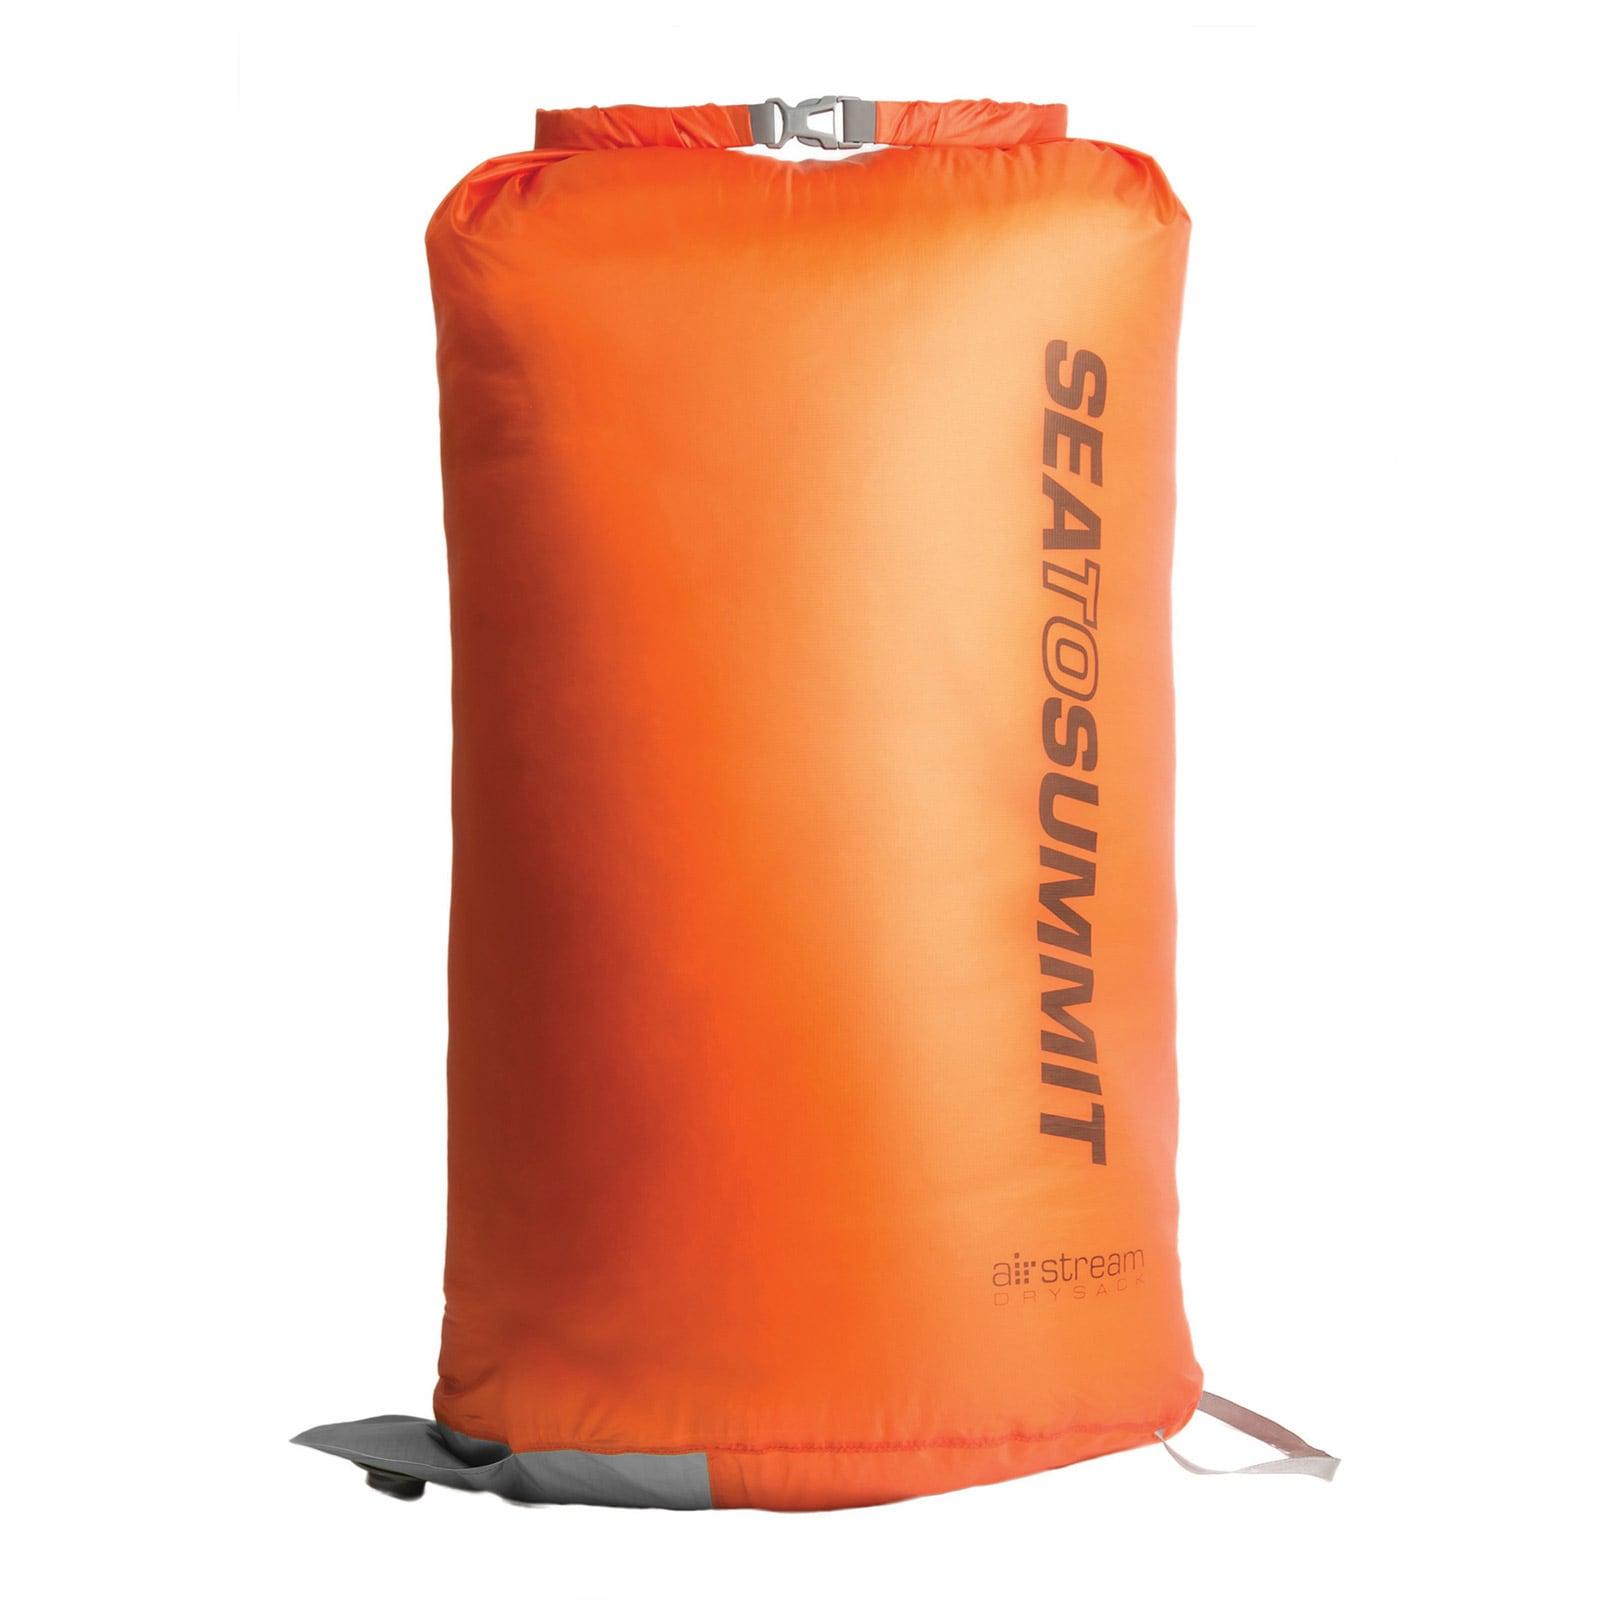 Sea To Summit Air Stream Dry Sack, 20L, Pumpesekk